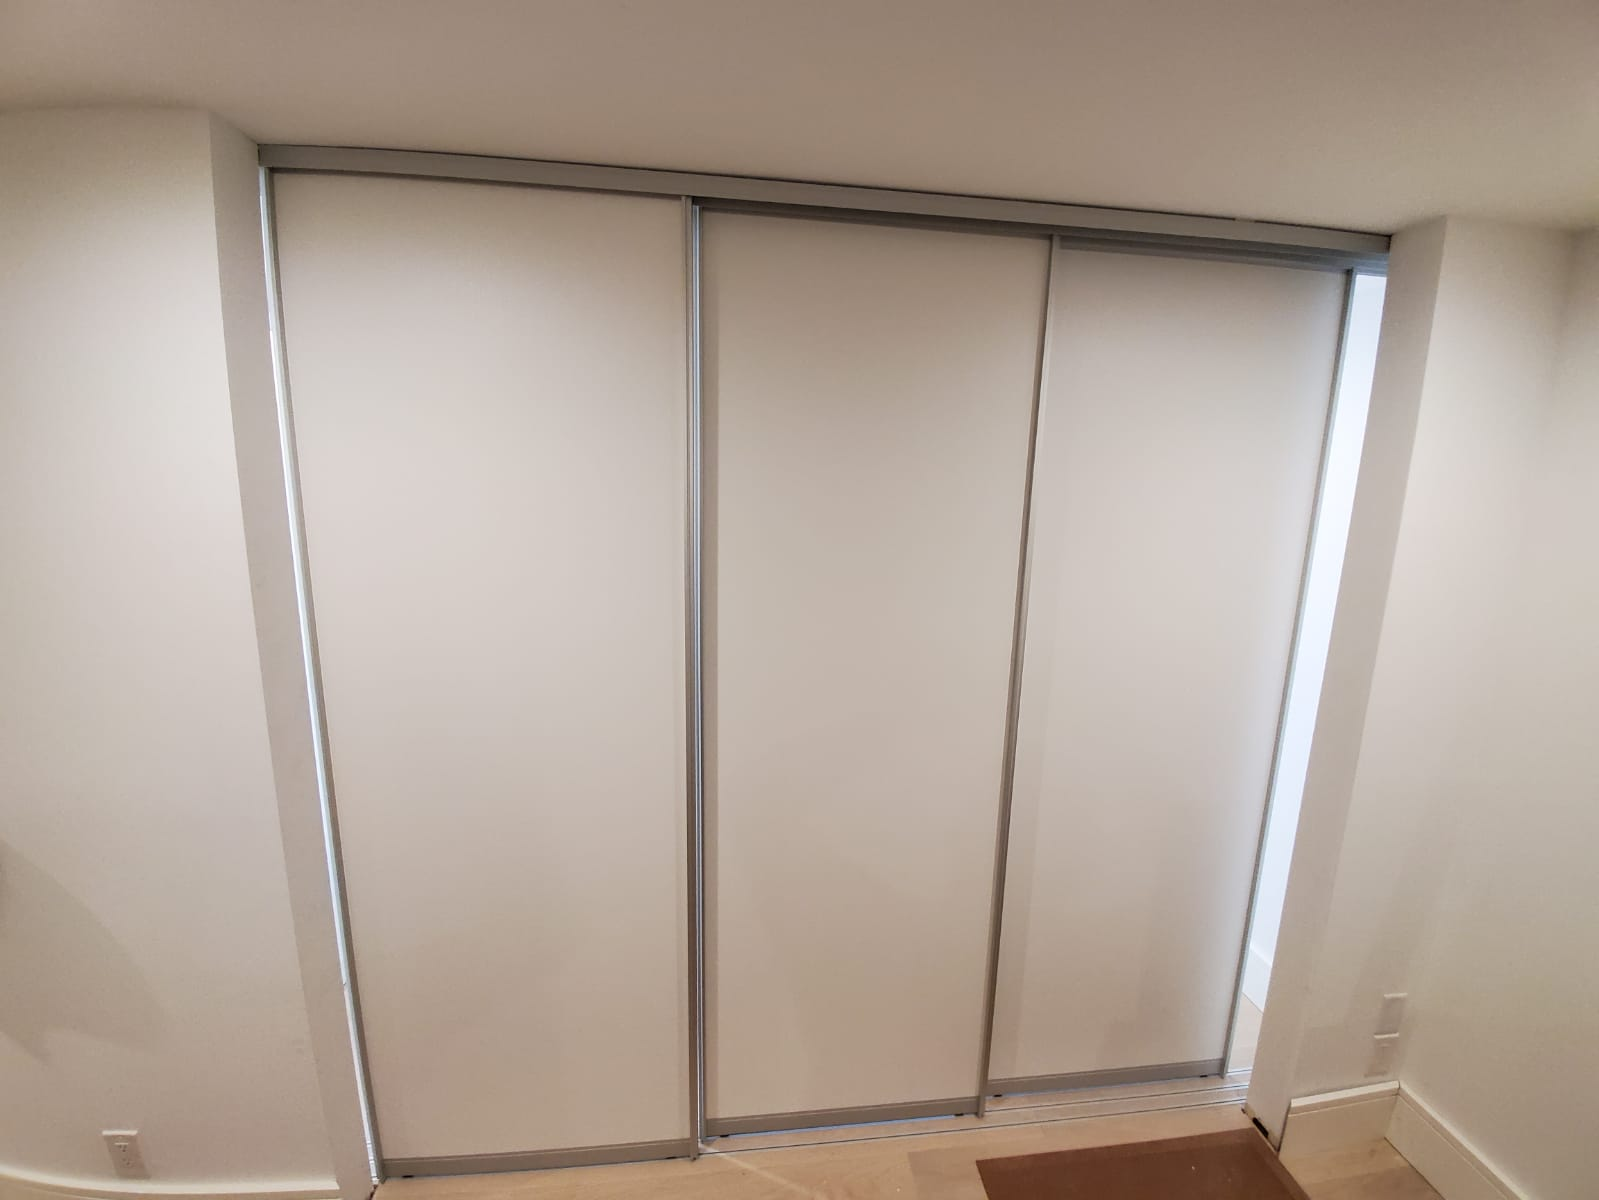 3 Panel Sliding Doors